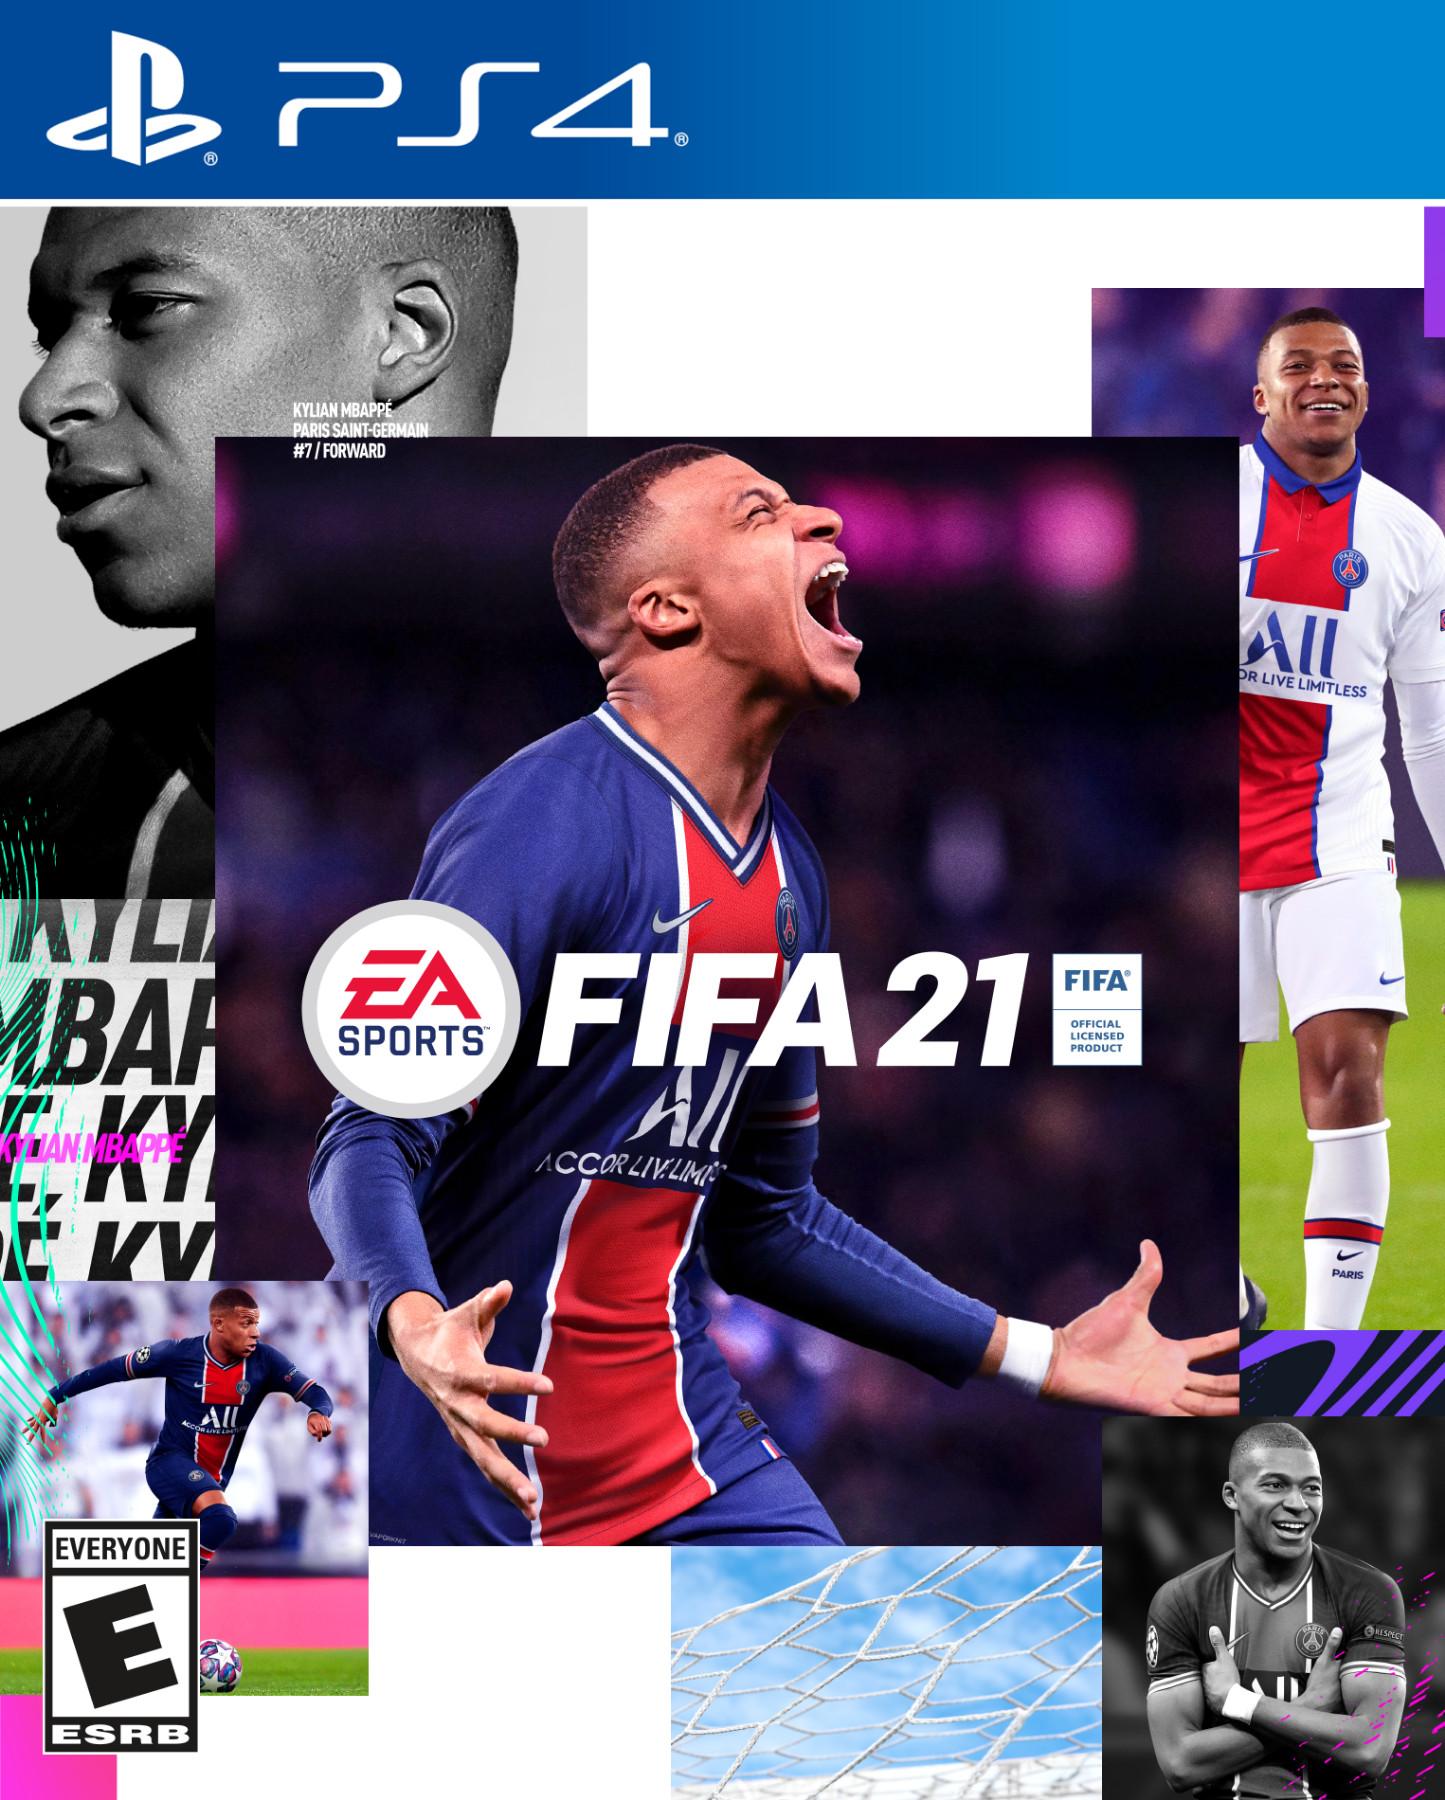 FIFA 21 Kylian Mbappé copertina